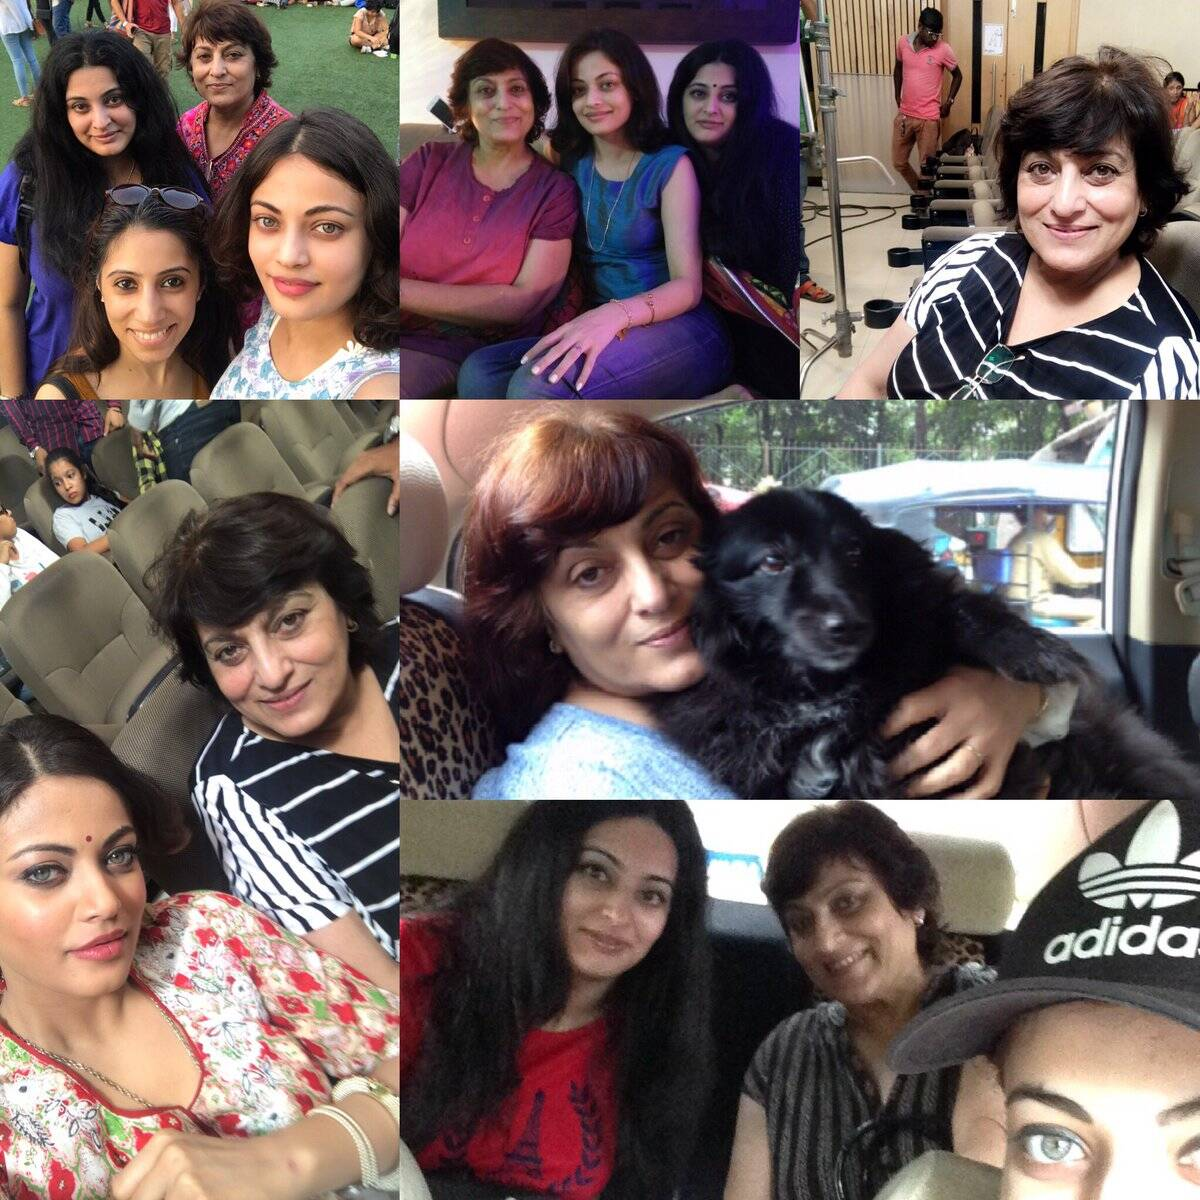 Sneha Ullal, Sneha Ullal latest news, Sneha Ullal film, Sneha Ullal upcoming film, Sneha Ullal health issues, sneha ullal family